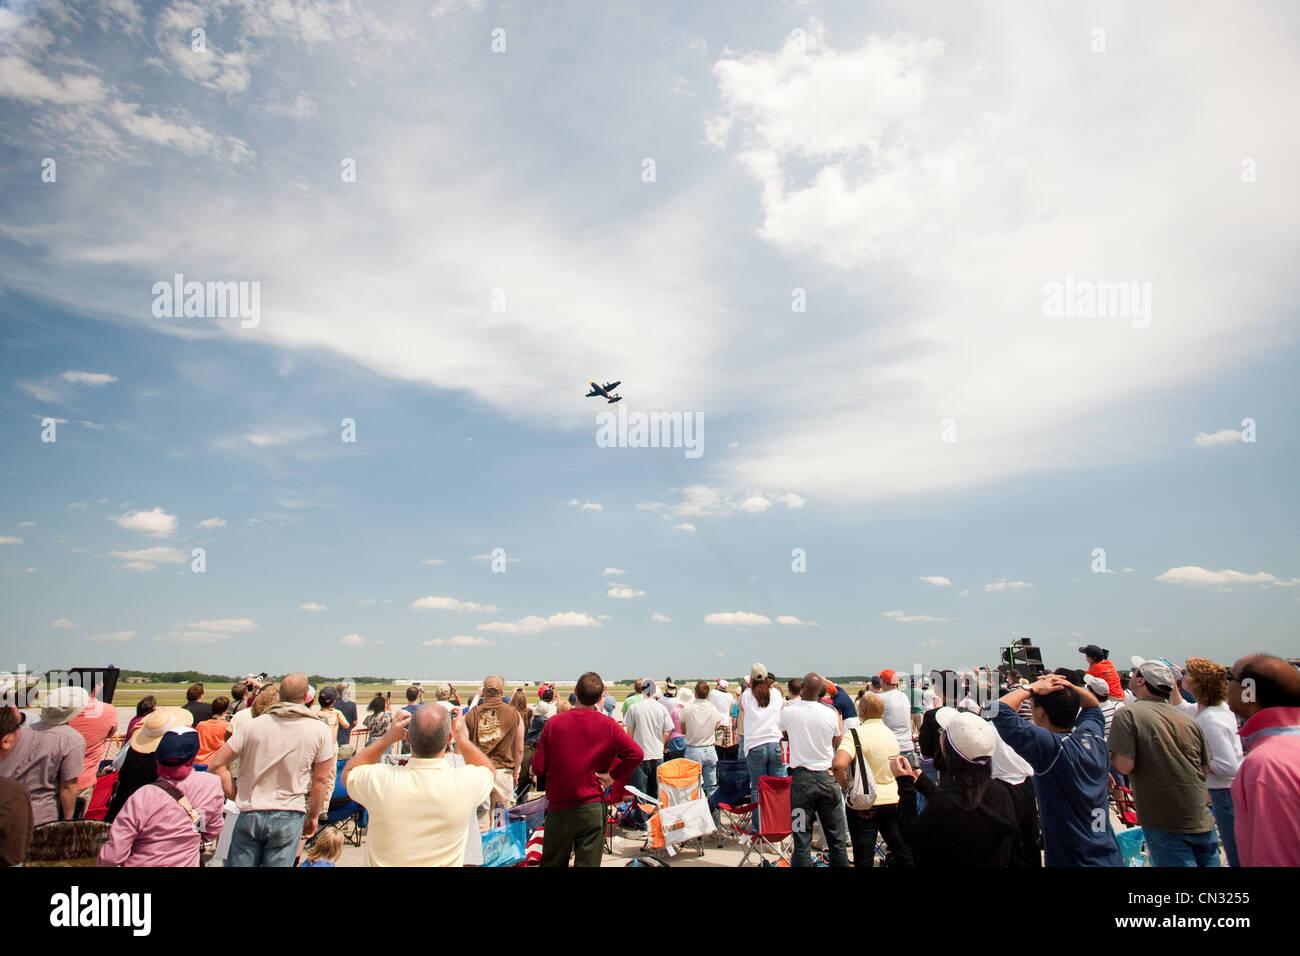 Spectators at airshow - Stock Image